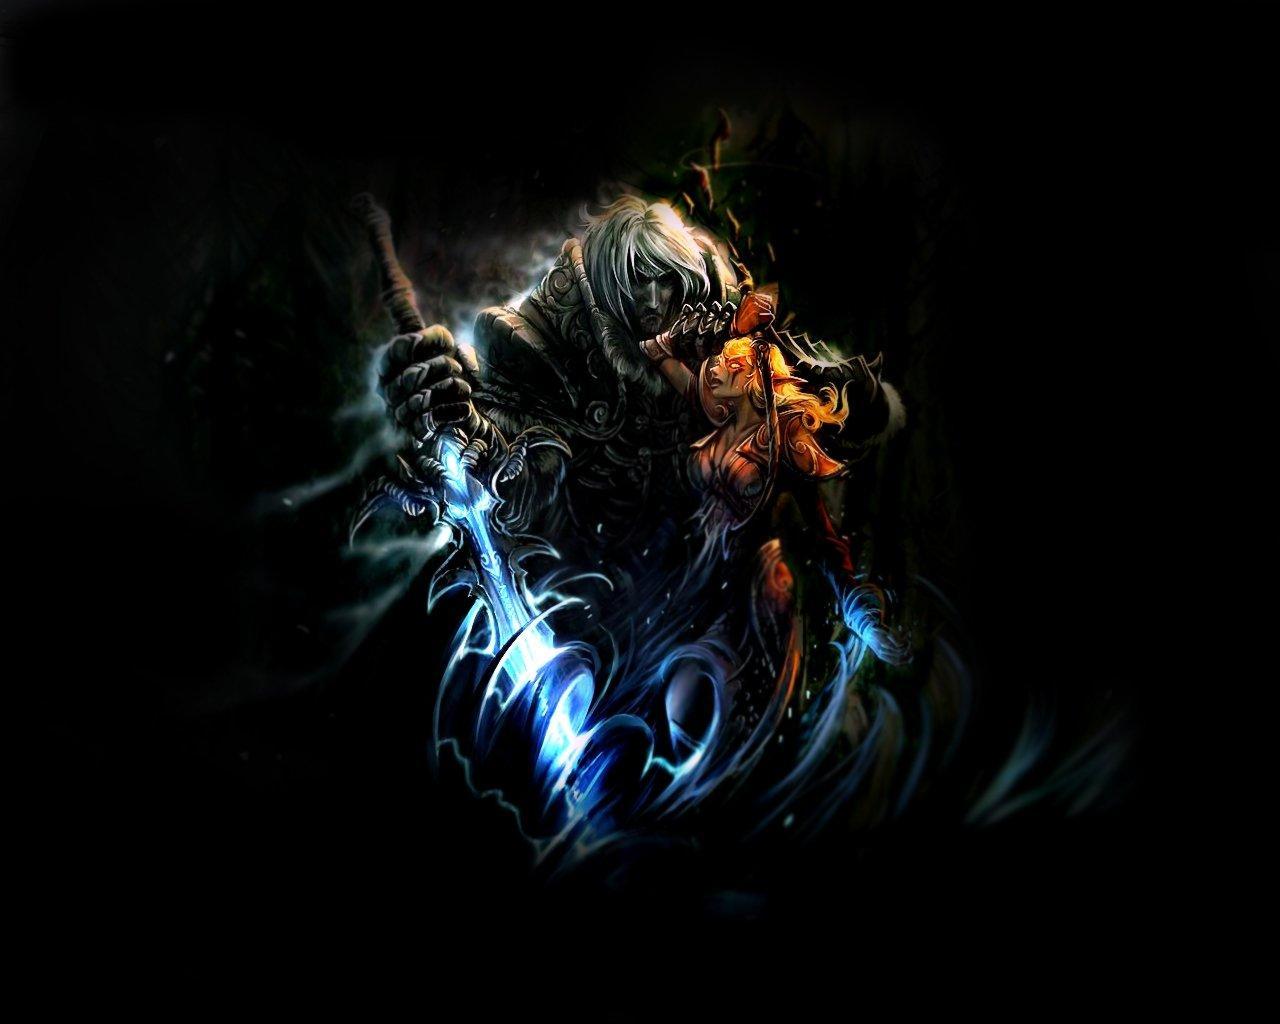 http://4.bp.blogspot.com/-0clyfpdHCOU/UAzIKpEO36I/AAAAAAAAB54/Do0zvOsqszw/s1600/warcraft+wallpaper+background+desktop+blizzard+game.jpg